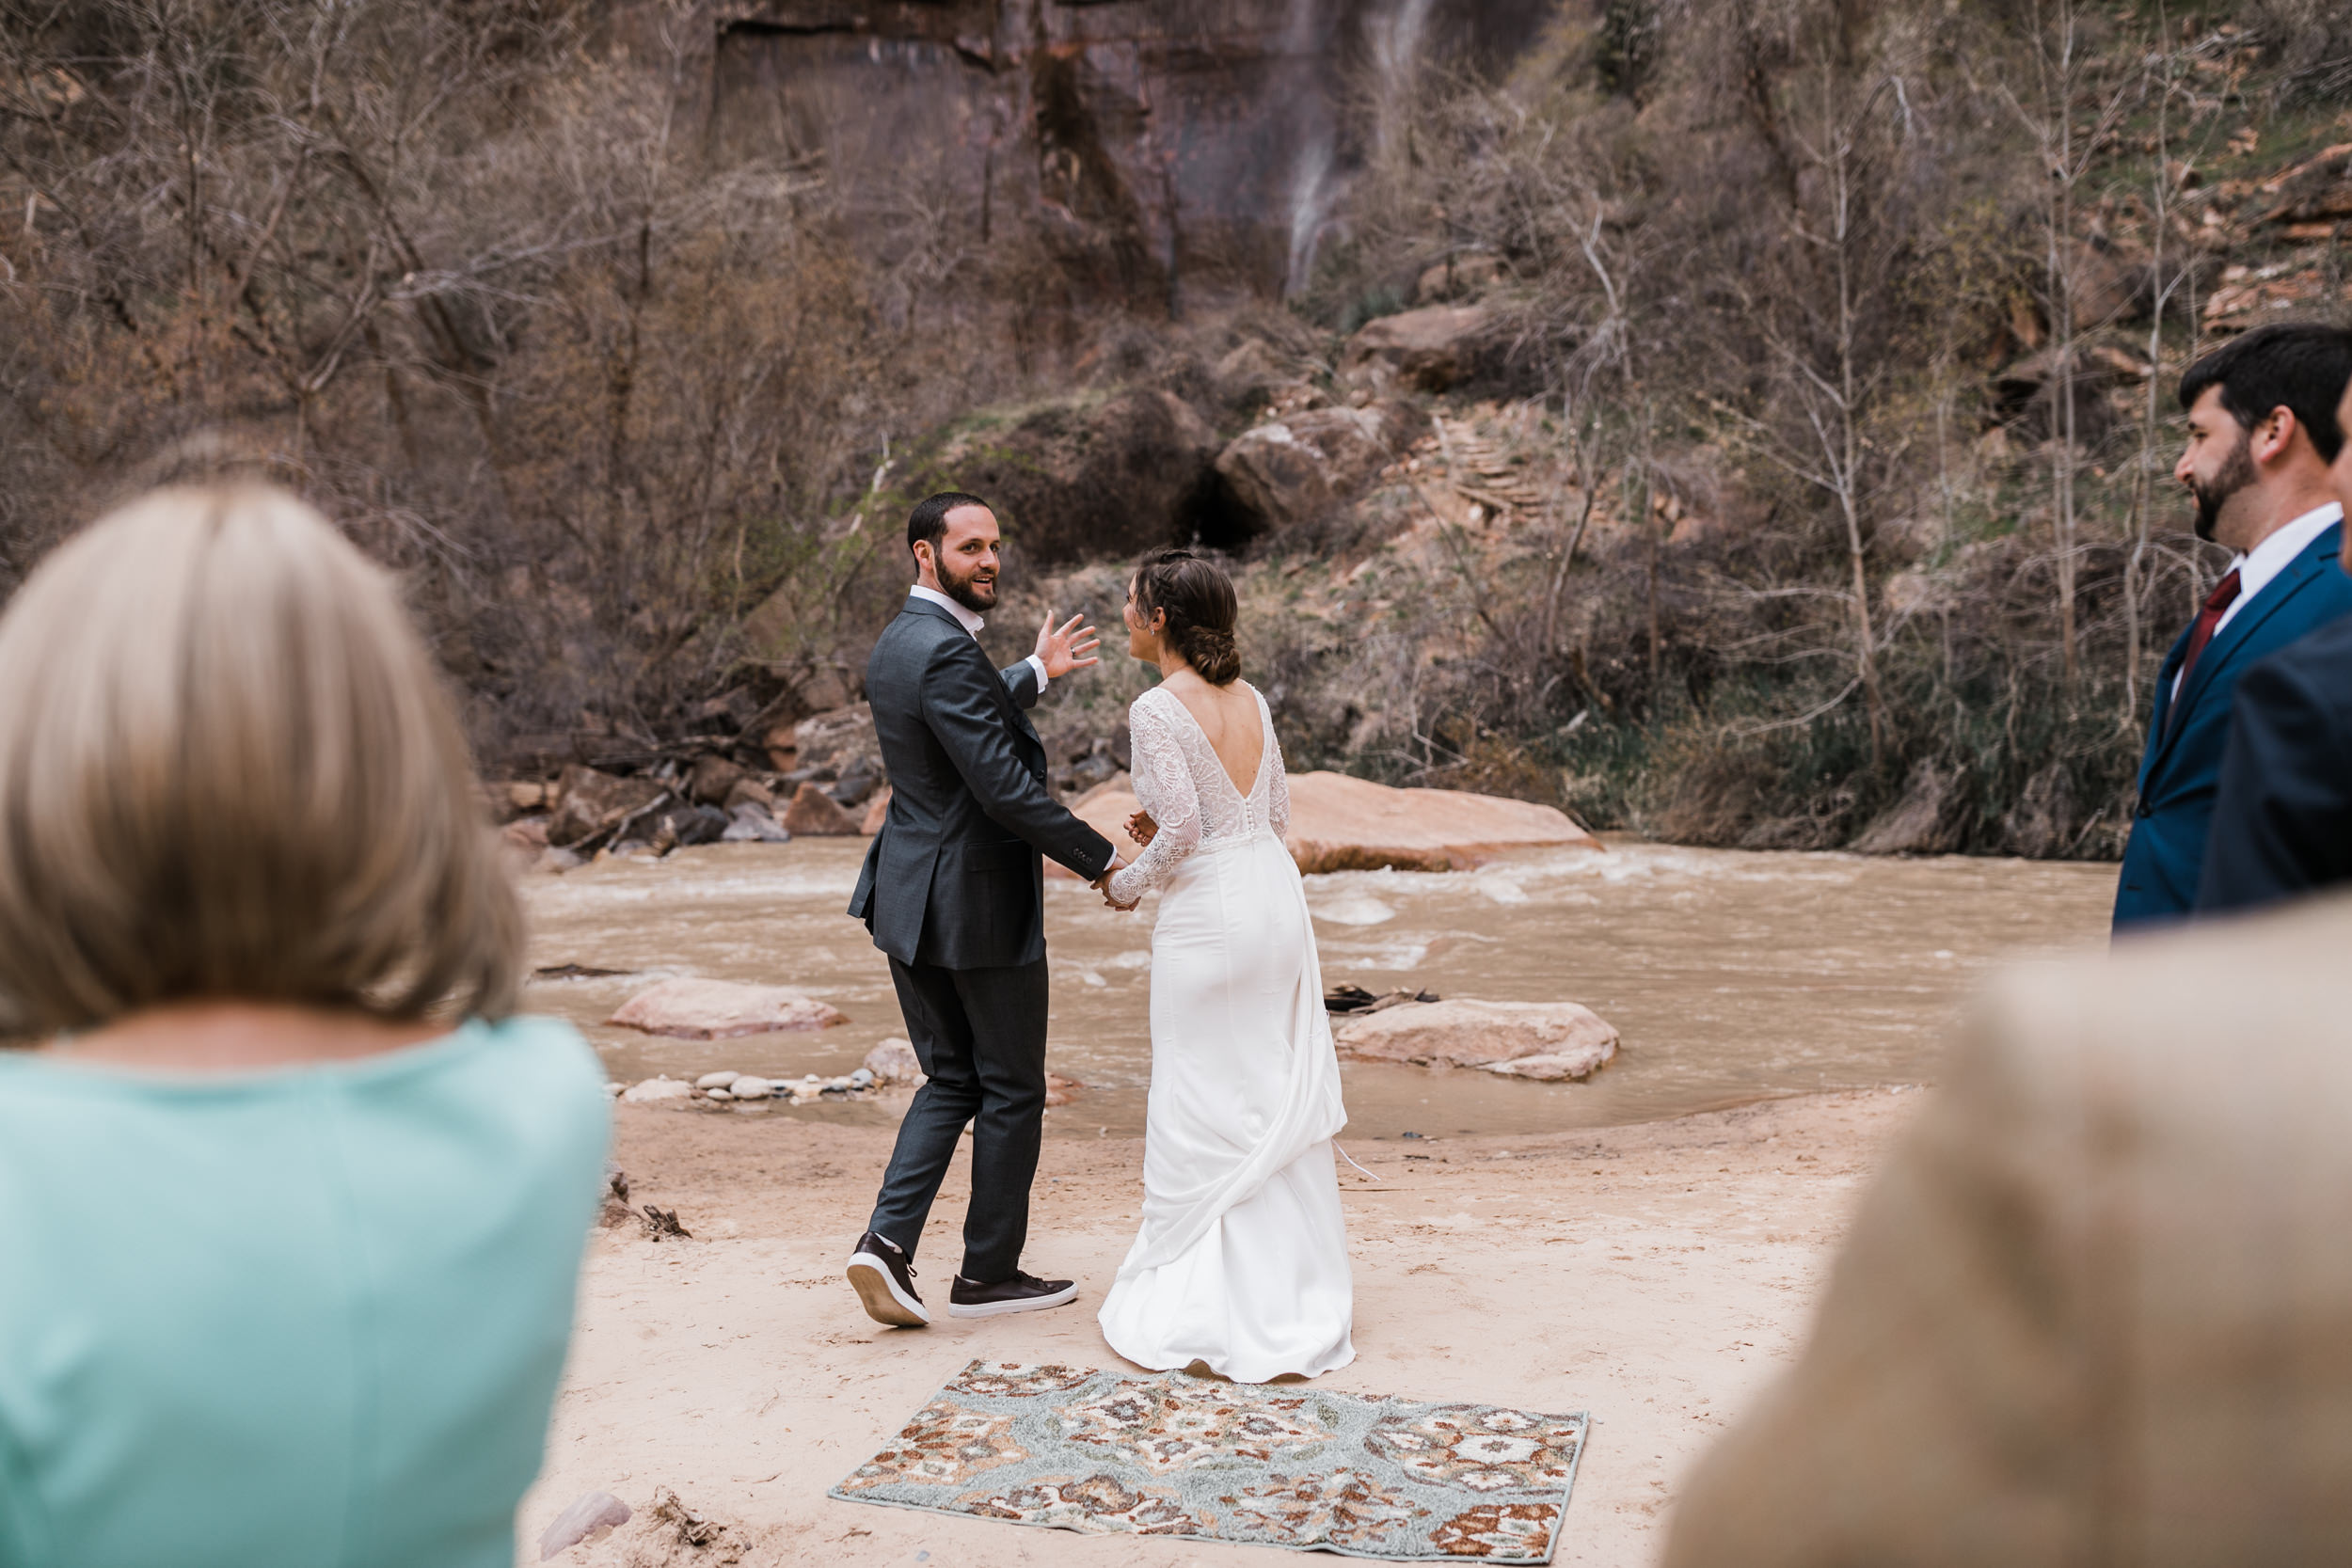 Zion-National-Park-Adventure-Wedding-Hearnes-Elopement-Photography-27.jpg